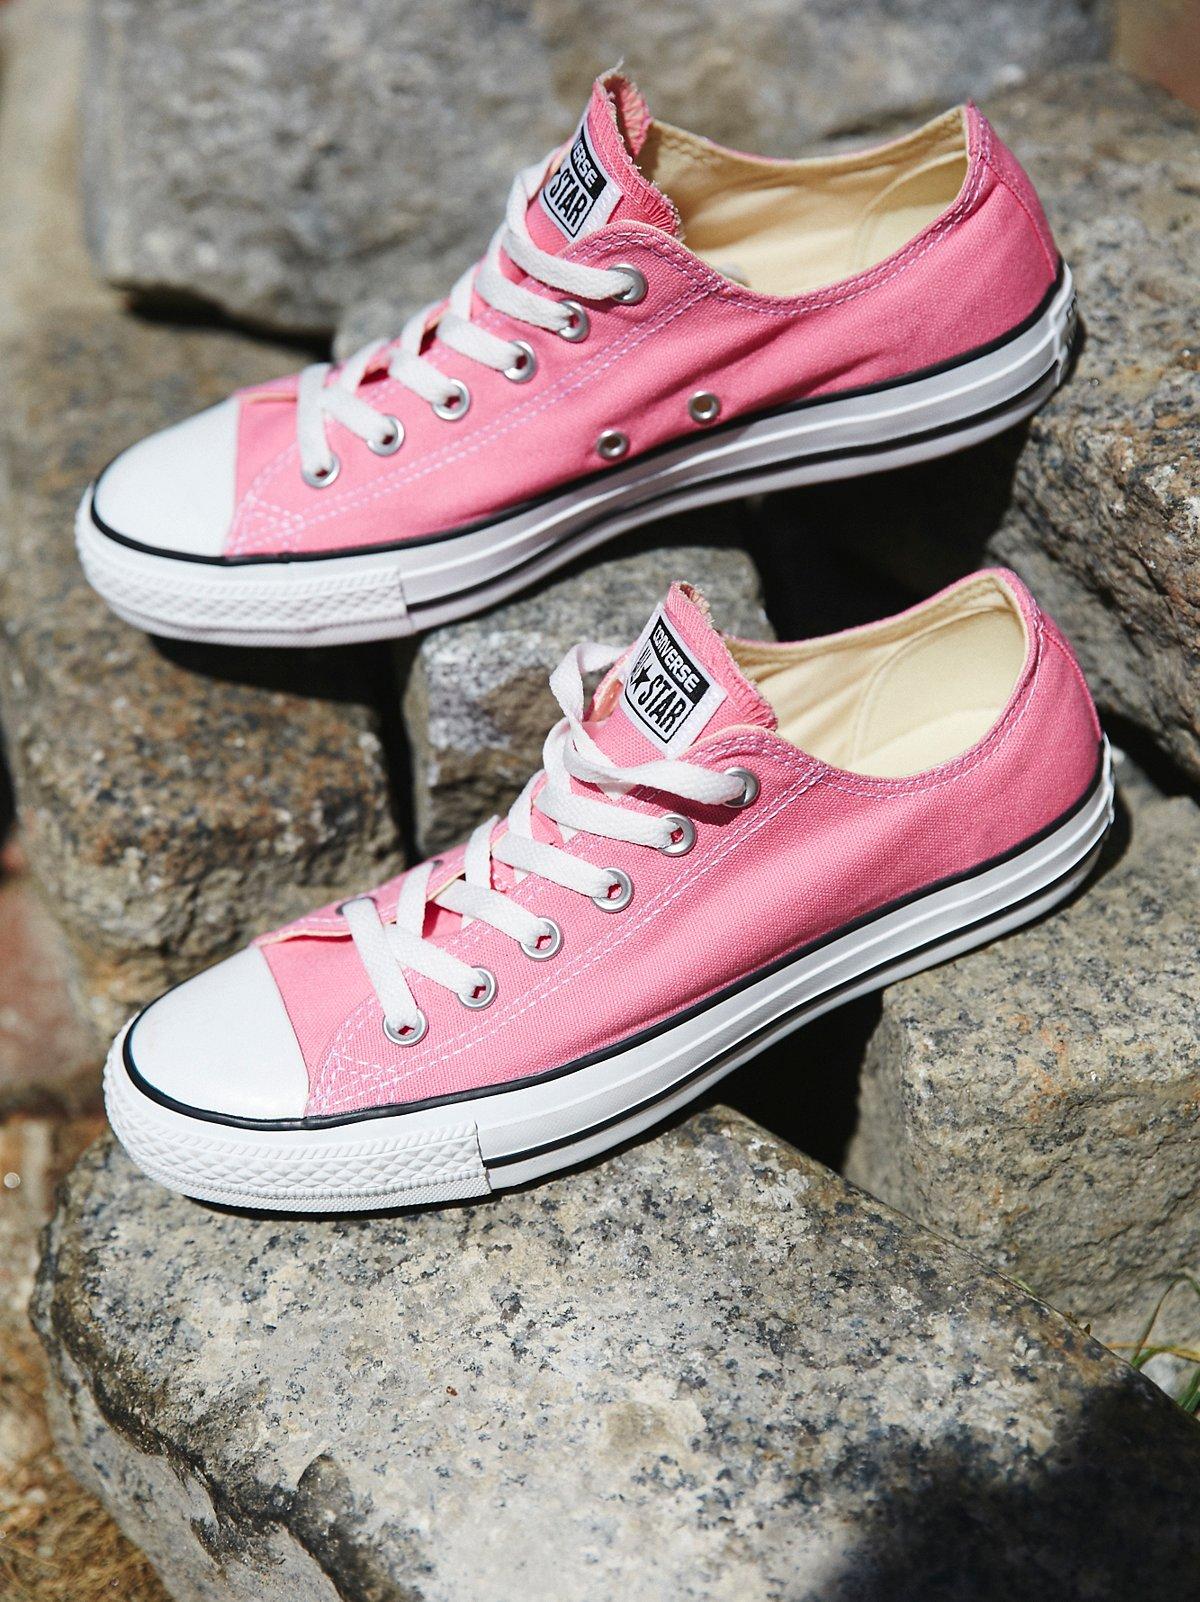 Charlie Converse帆布鞋